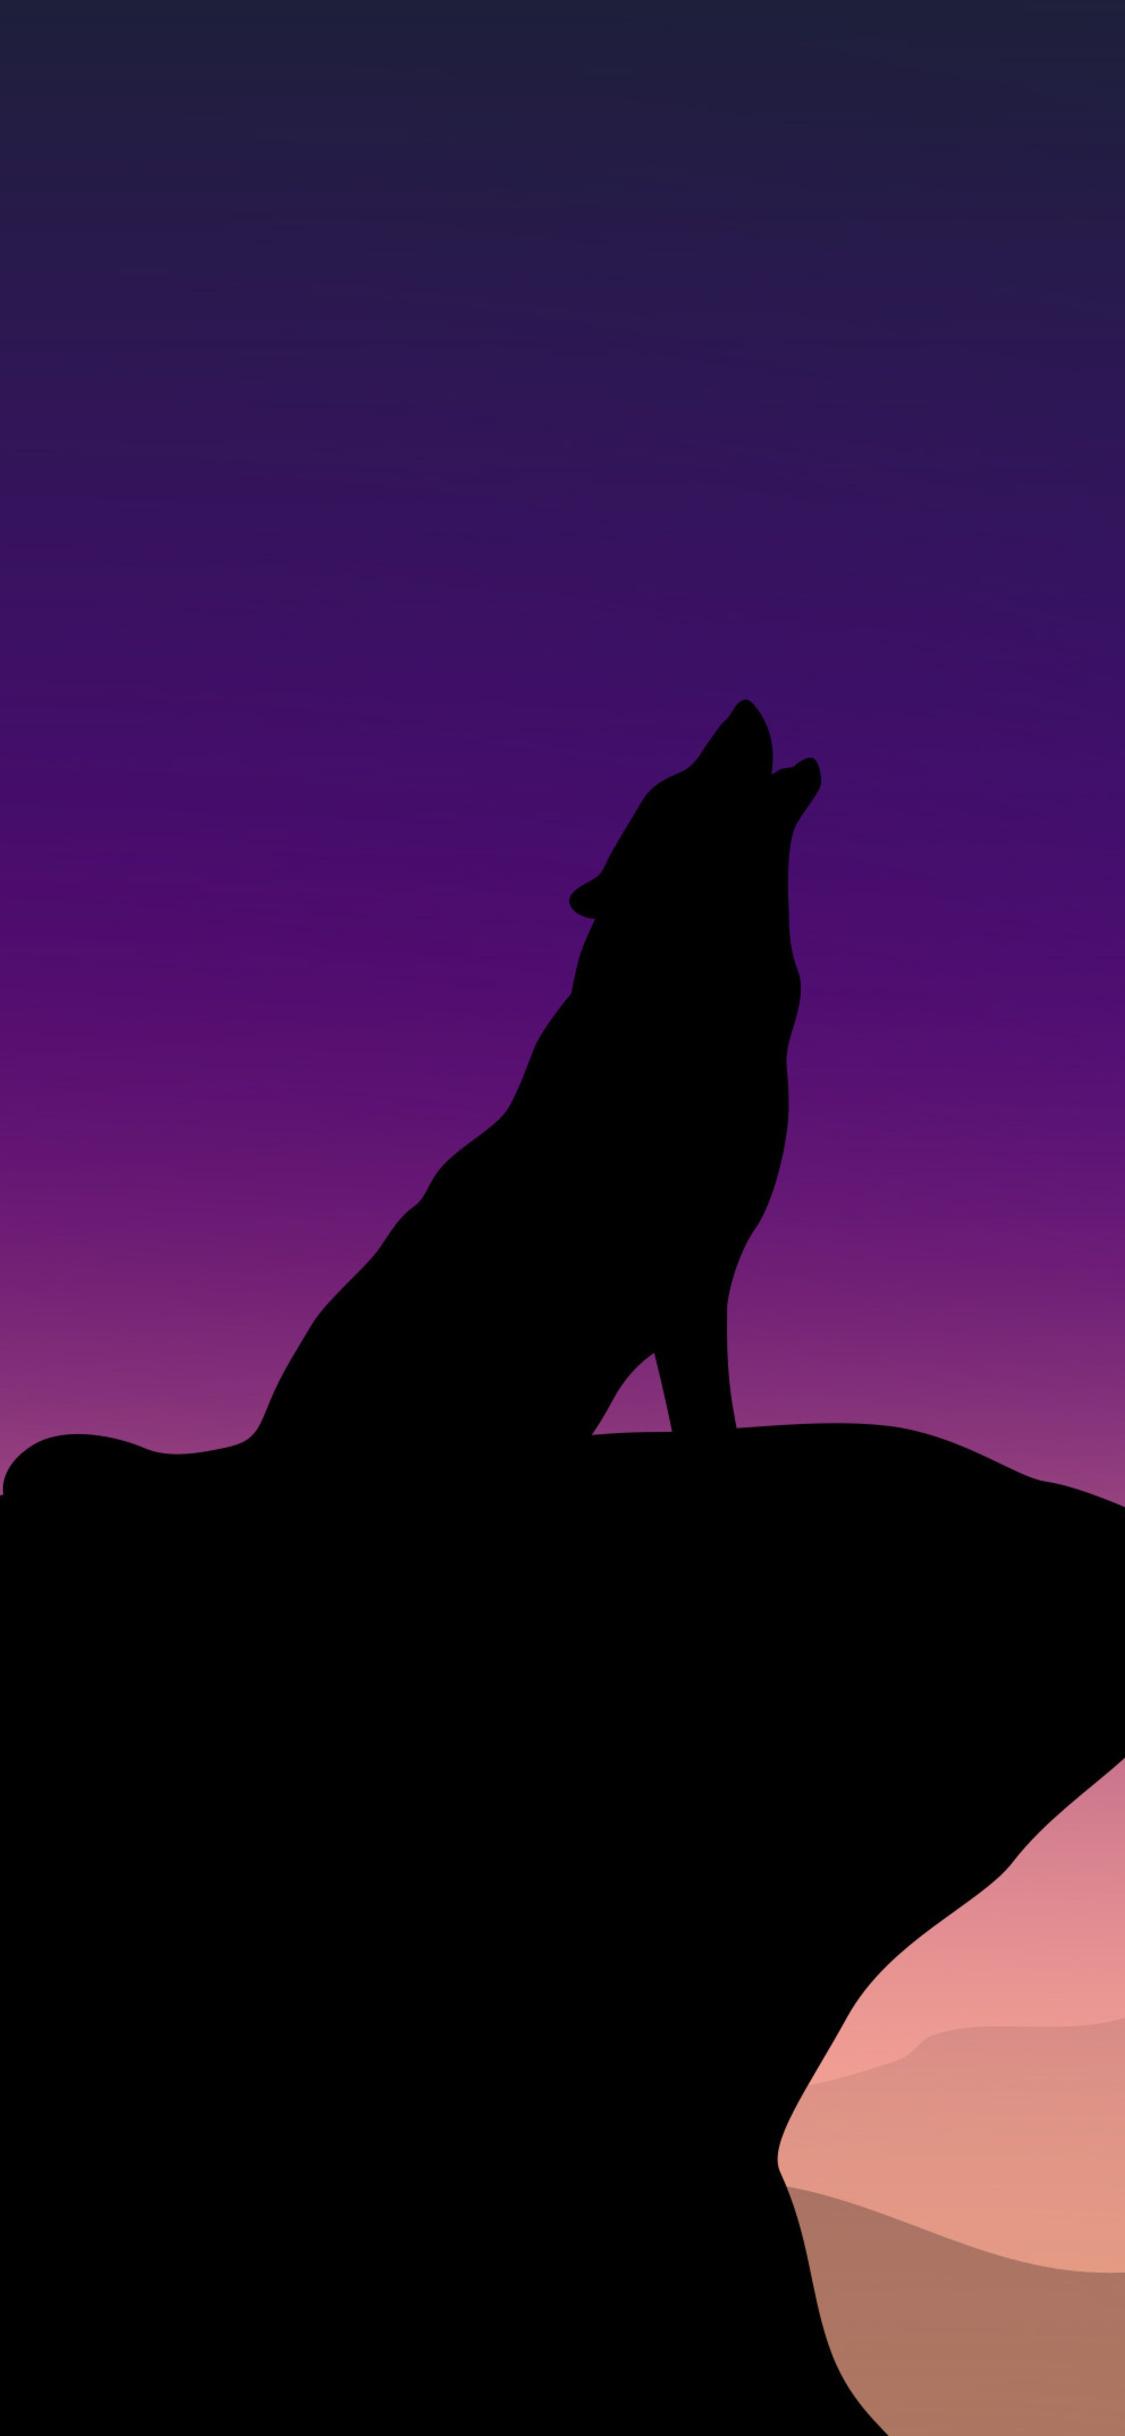 1125x2436 Howling Wolf Minimalism 4k Iphone XS,Iphone 10 ...